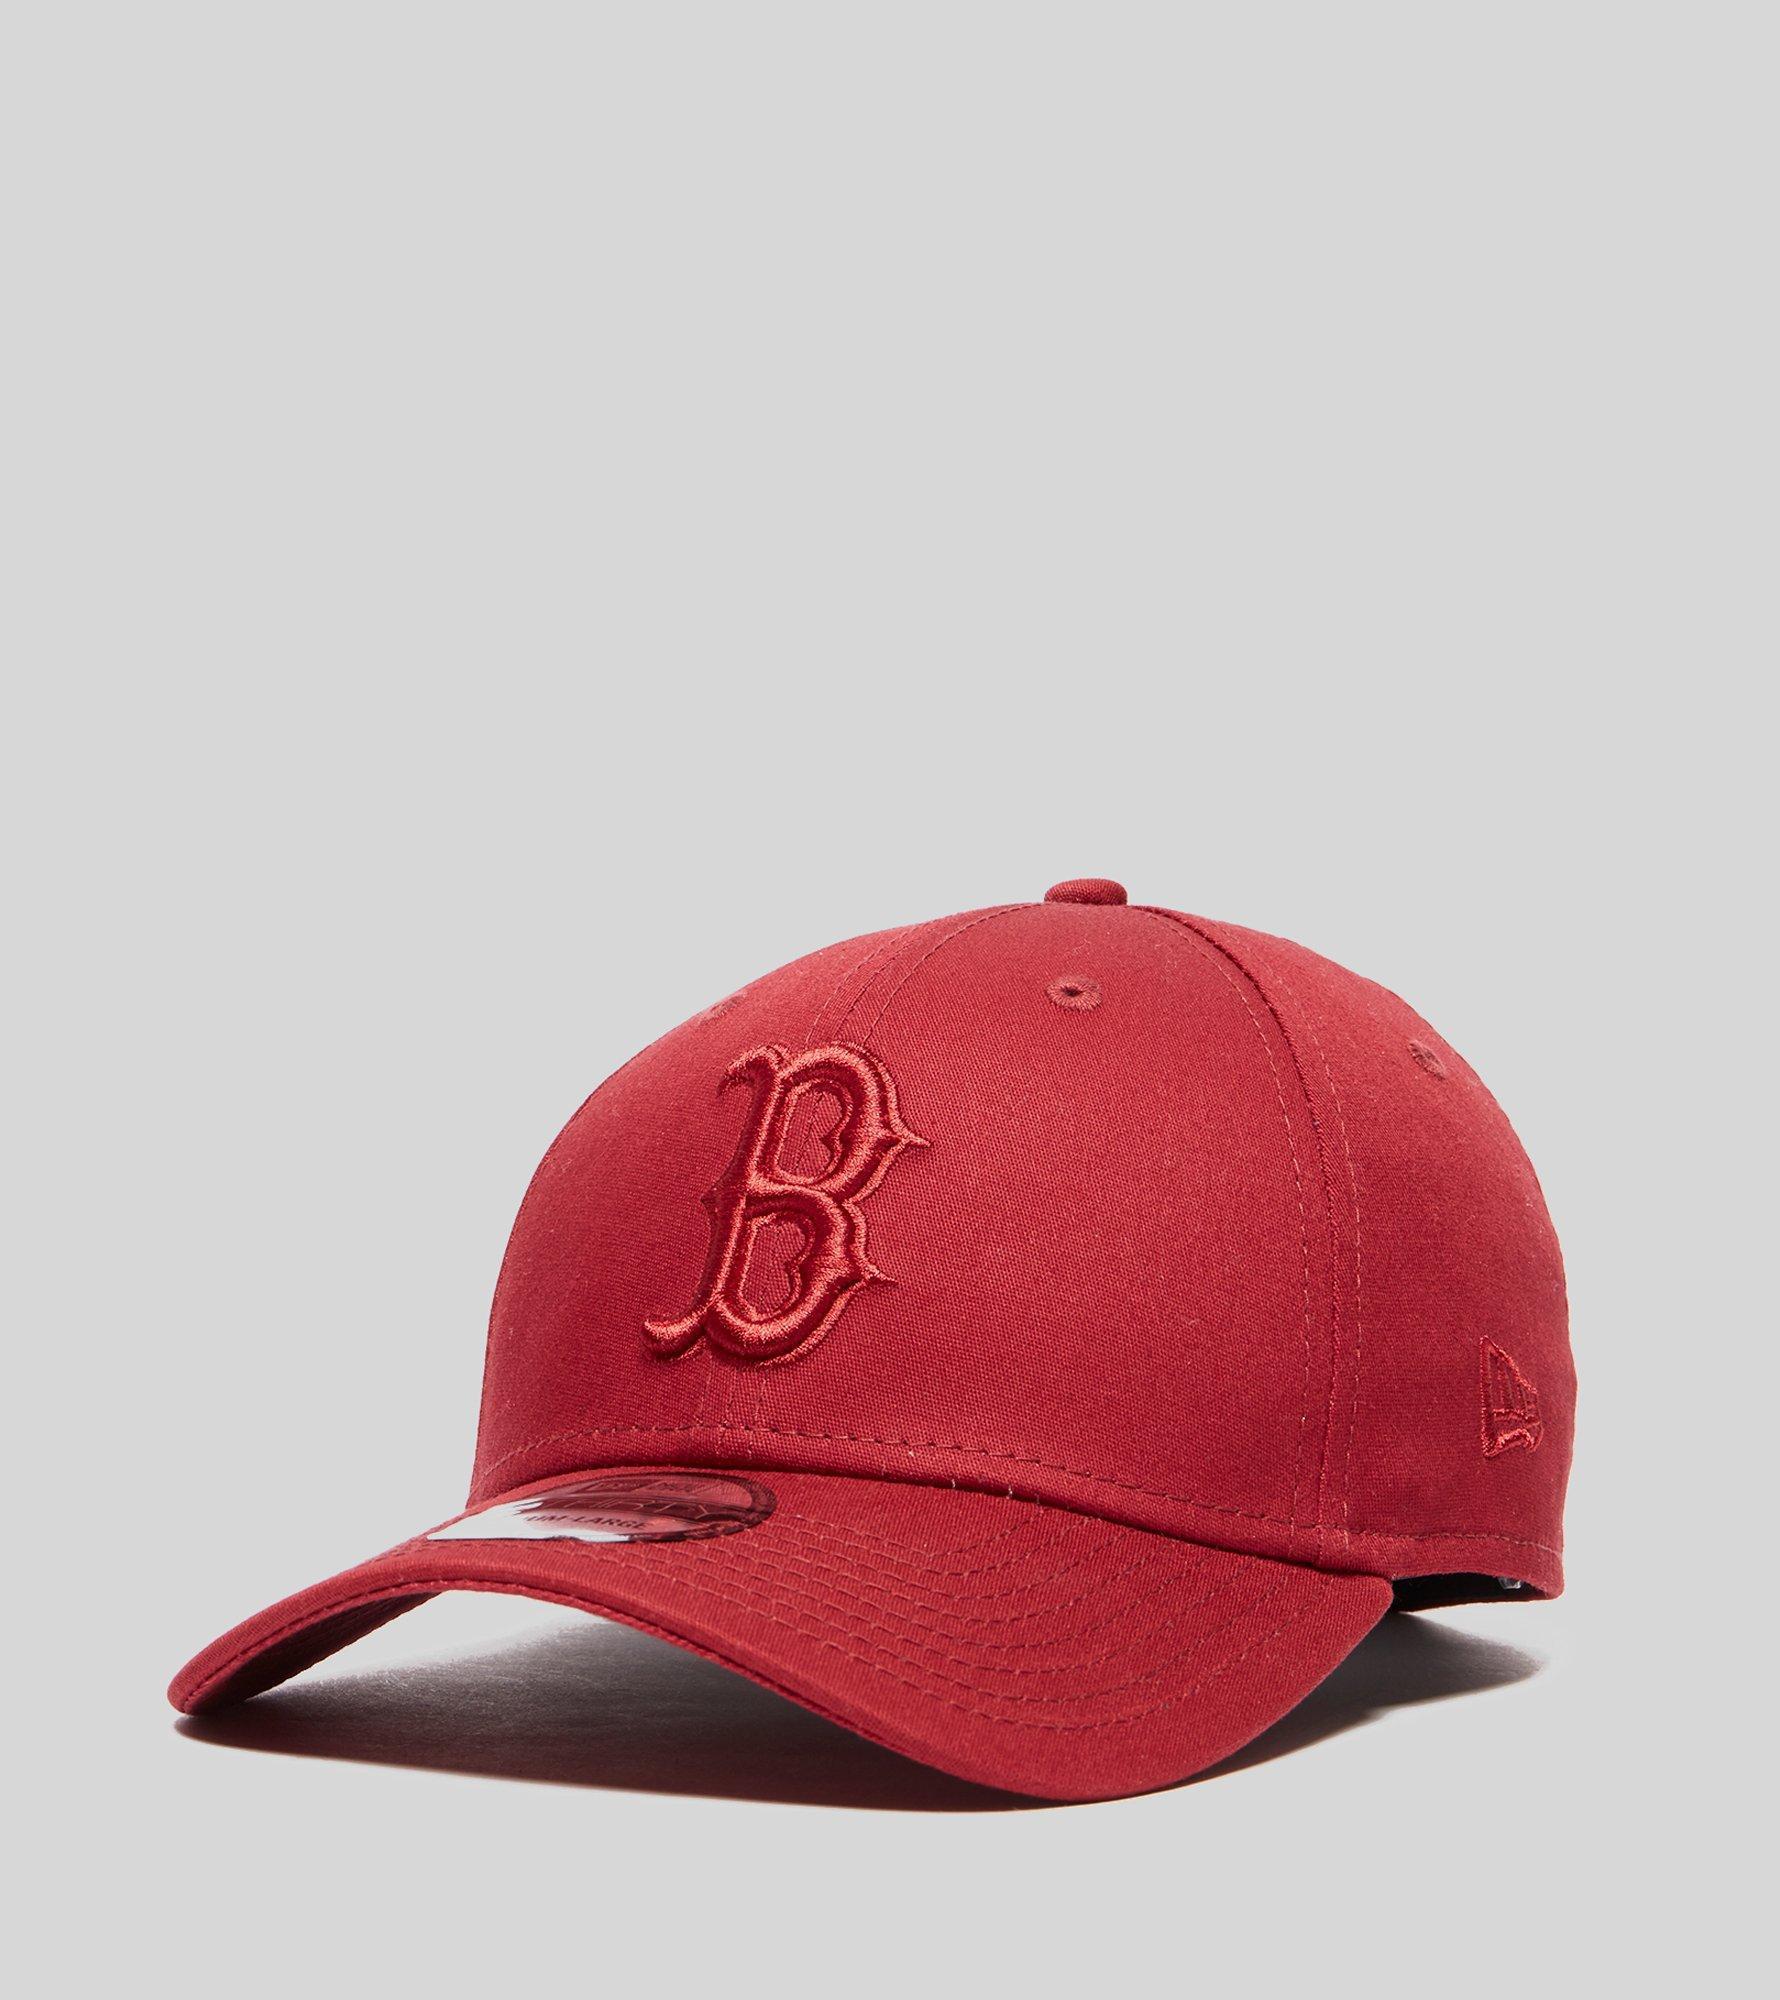 check out 837e4 a93c2 france ktz boston red sox 39thirty cap lyst. view fullscreen 06ec9 7dde5